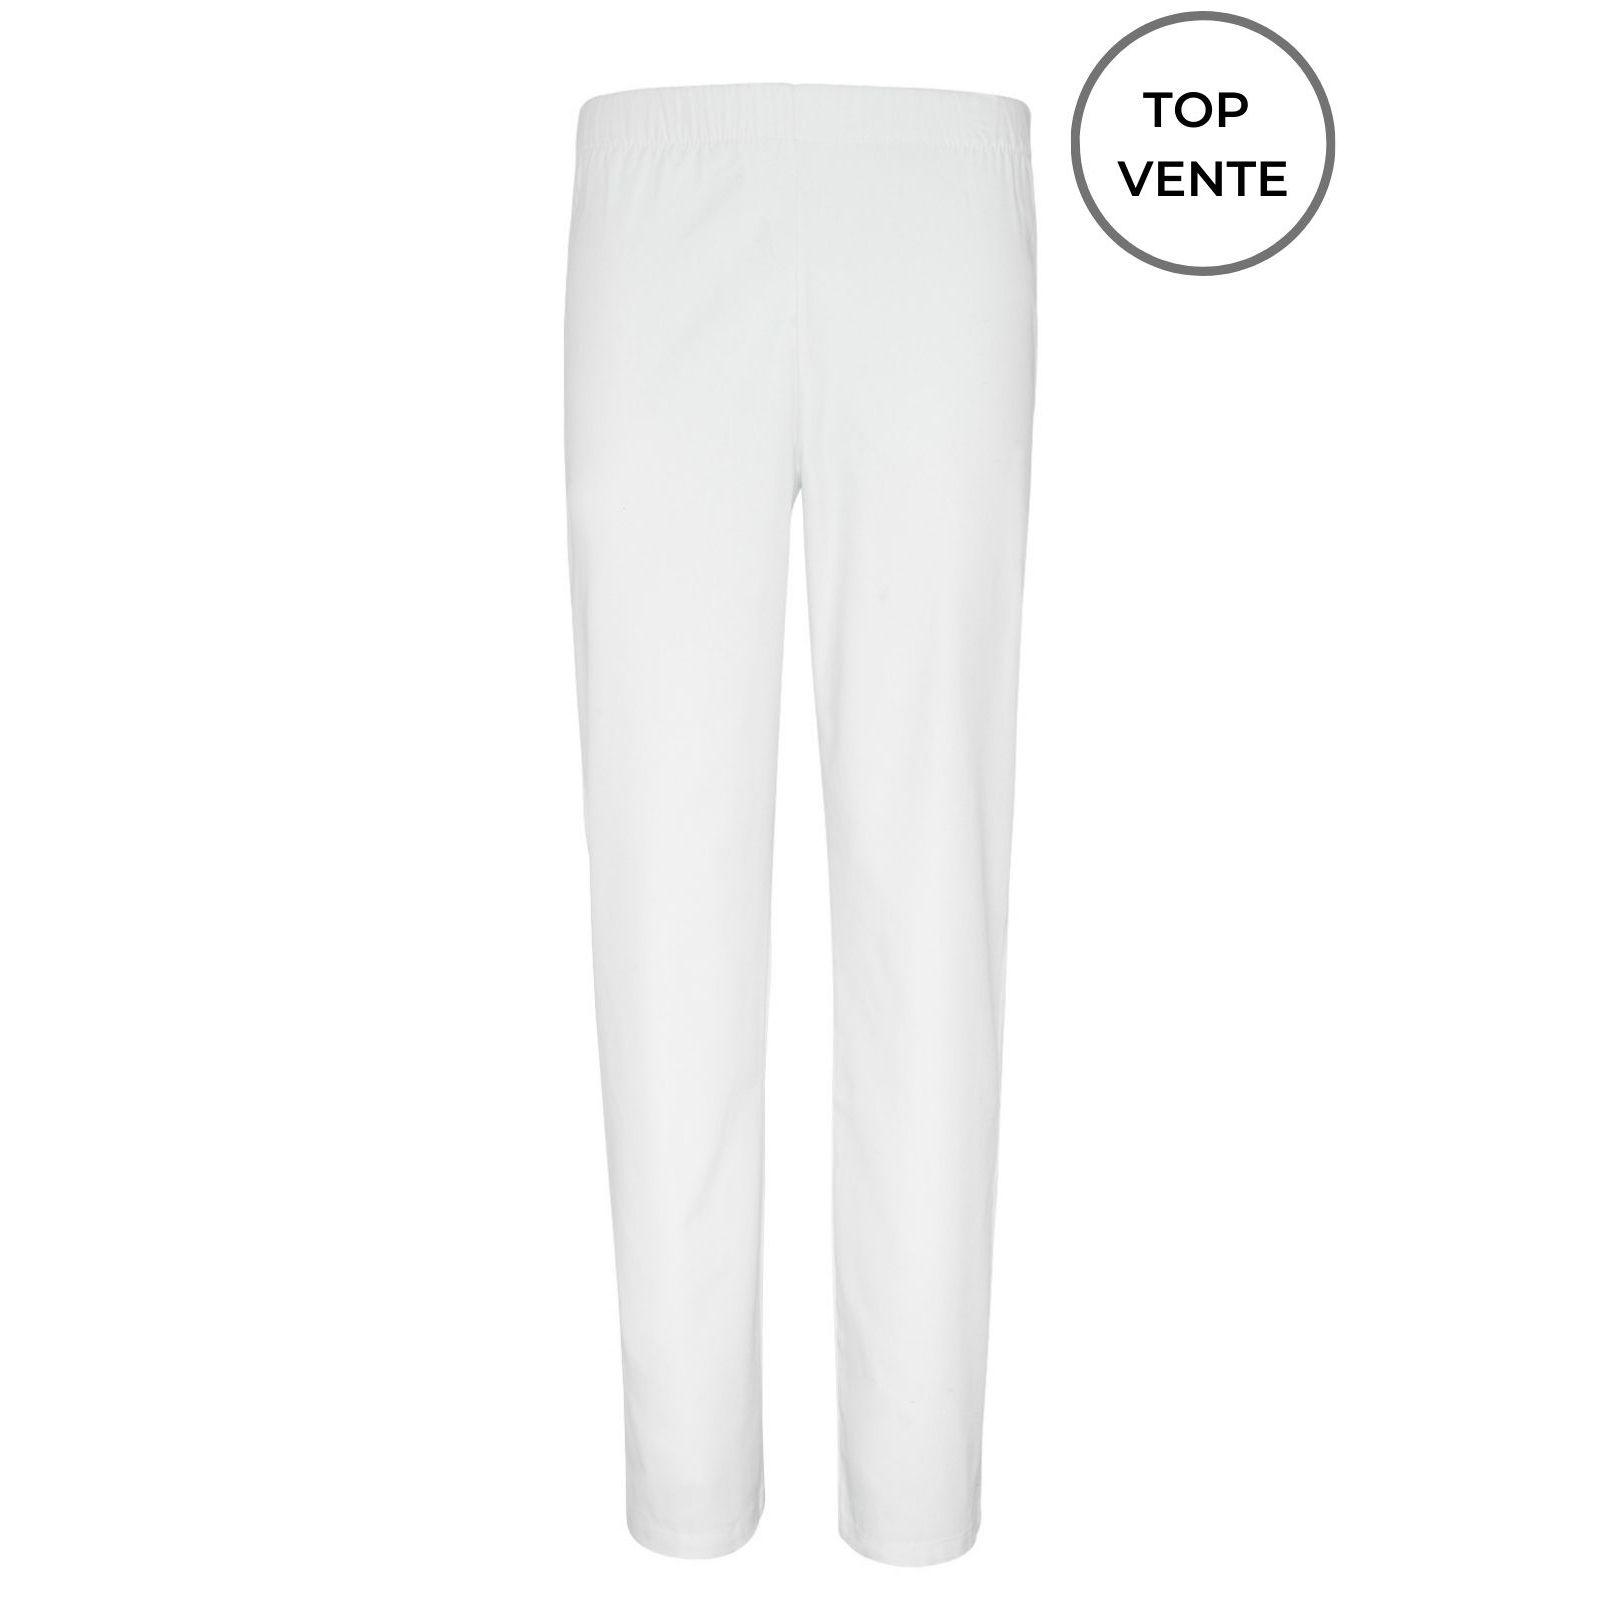 White Unisex Medical Pants, 60 degree wash (CH11)